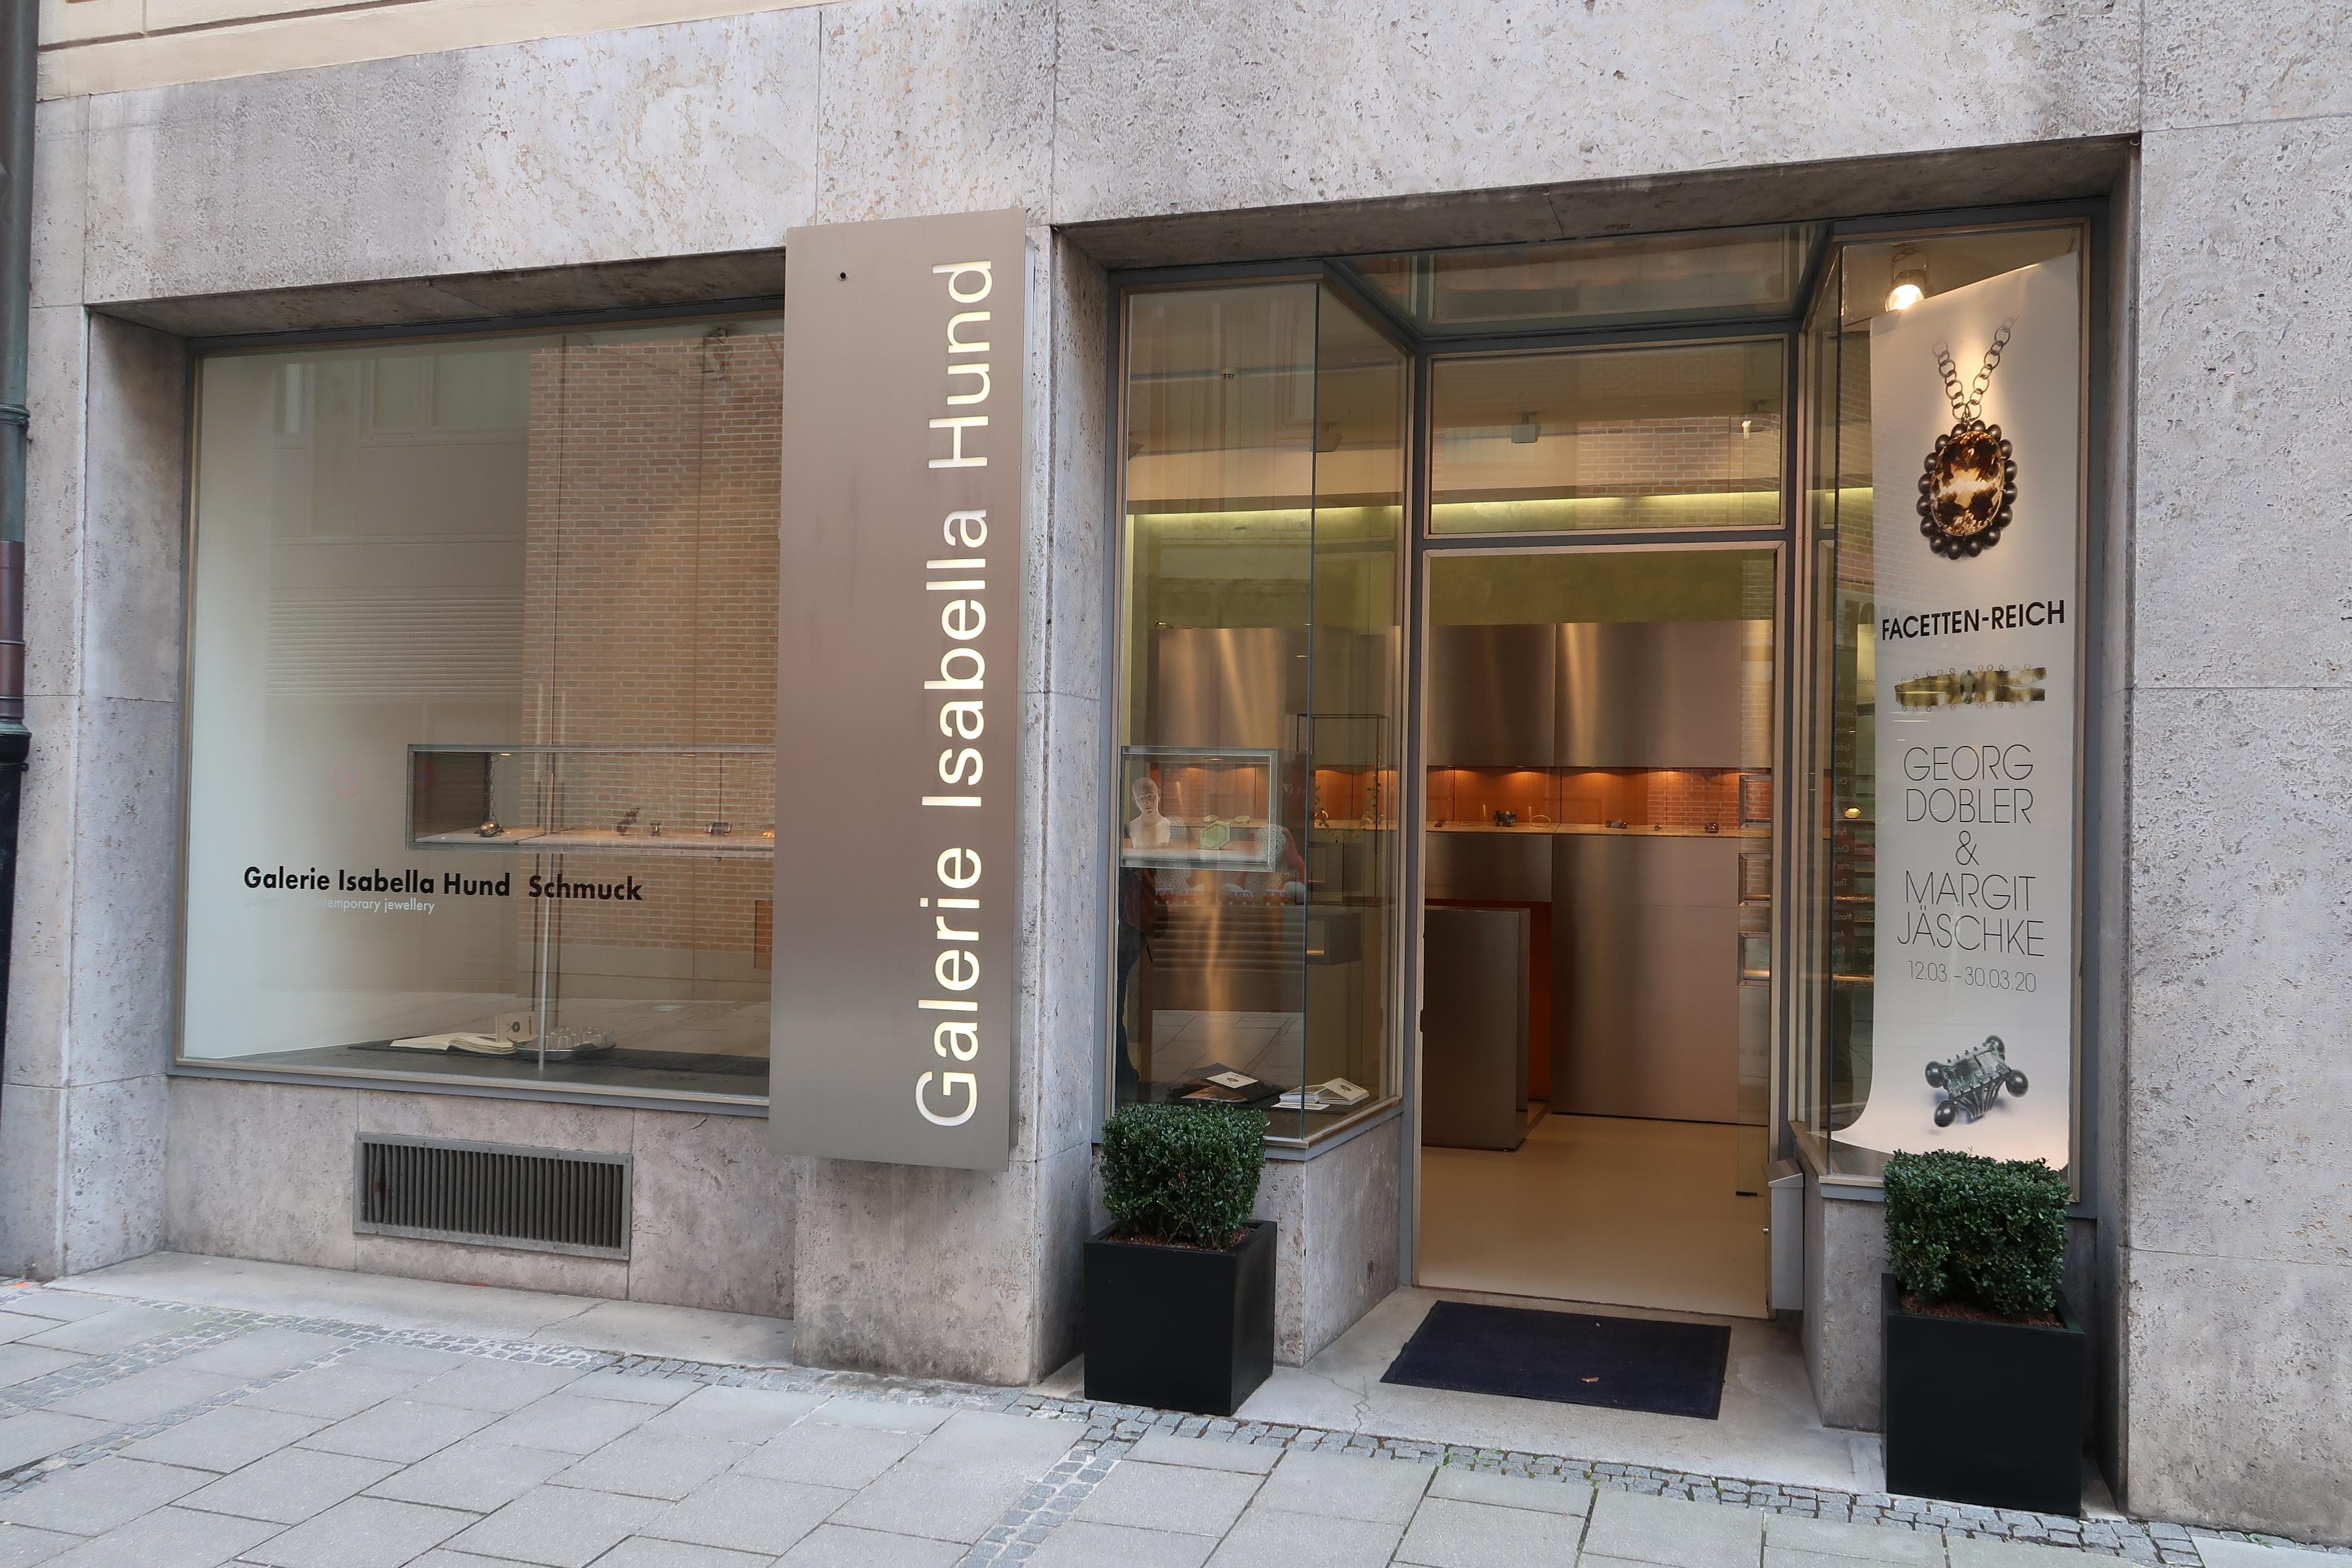 Galerie Isabella Hund, gevel, München, 12 maart 2020. Foto Coert Peter Krabbe